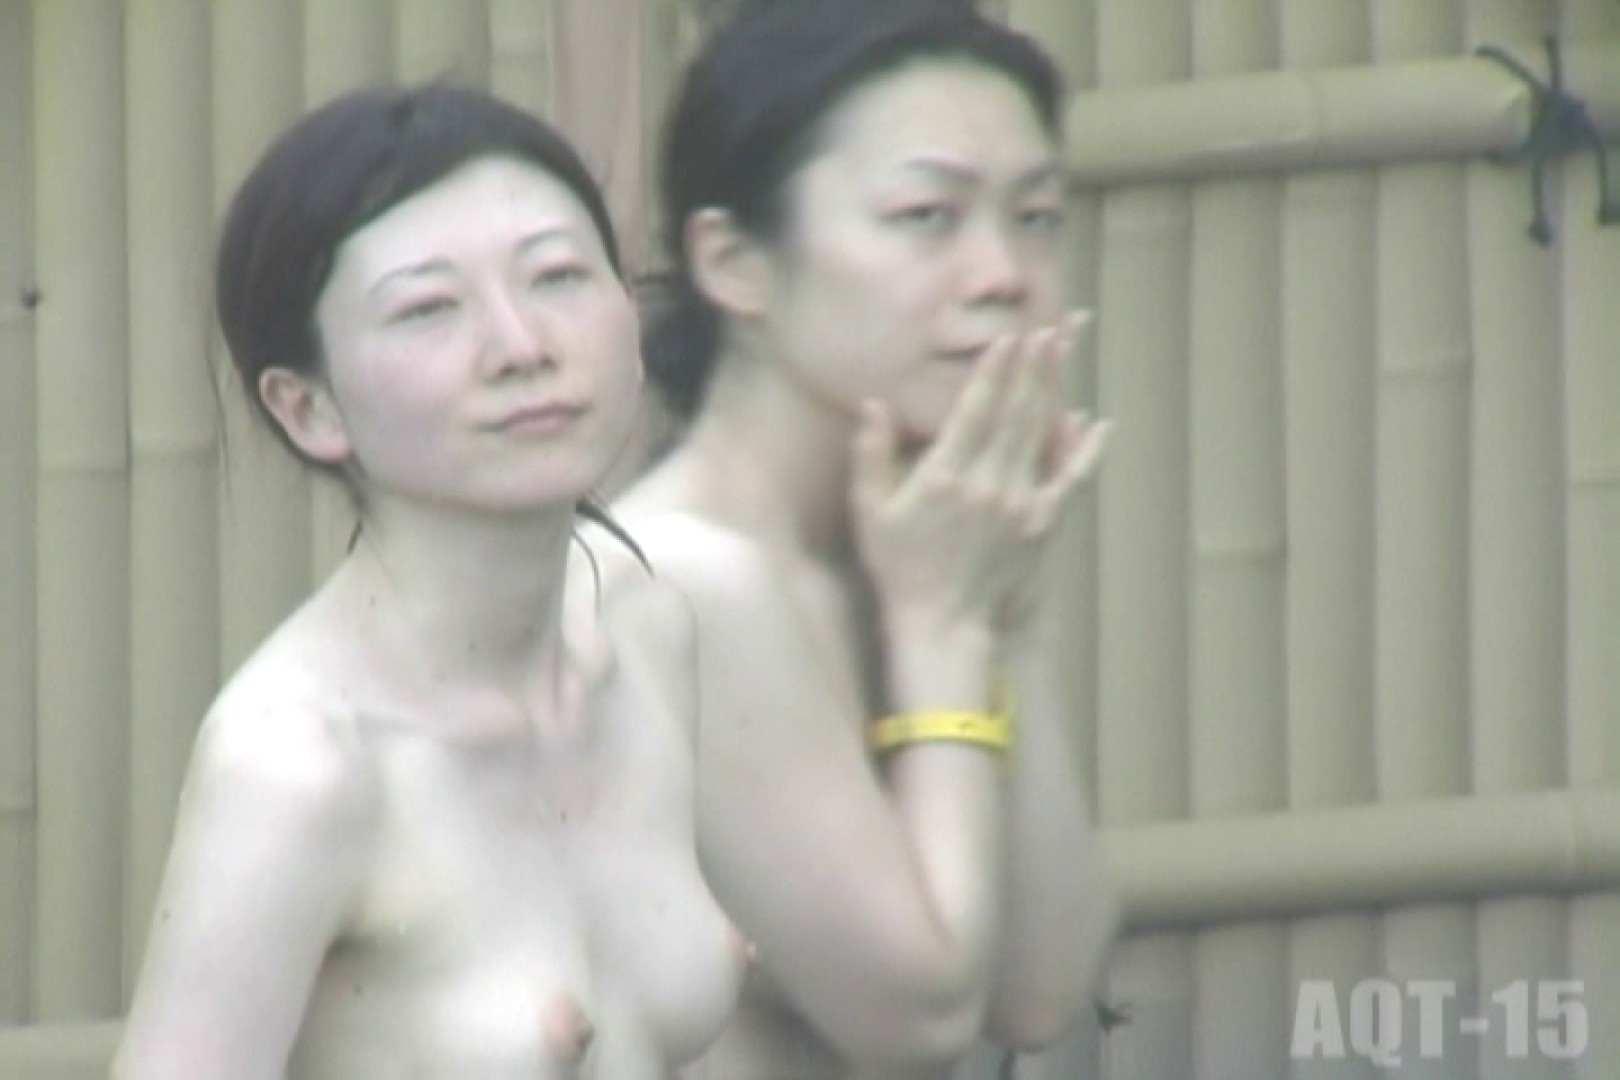 Aquaな露天風呂Vol.835 露天風呂 スケベ動画紹介 65連発 20